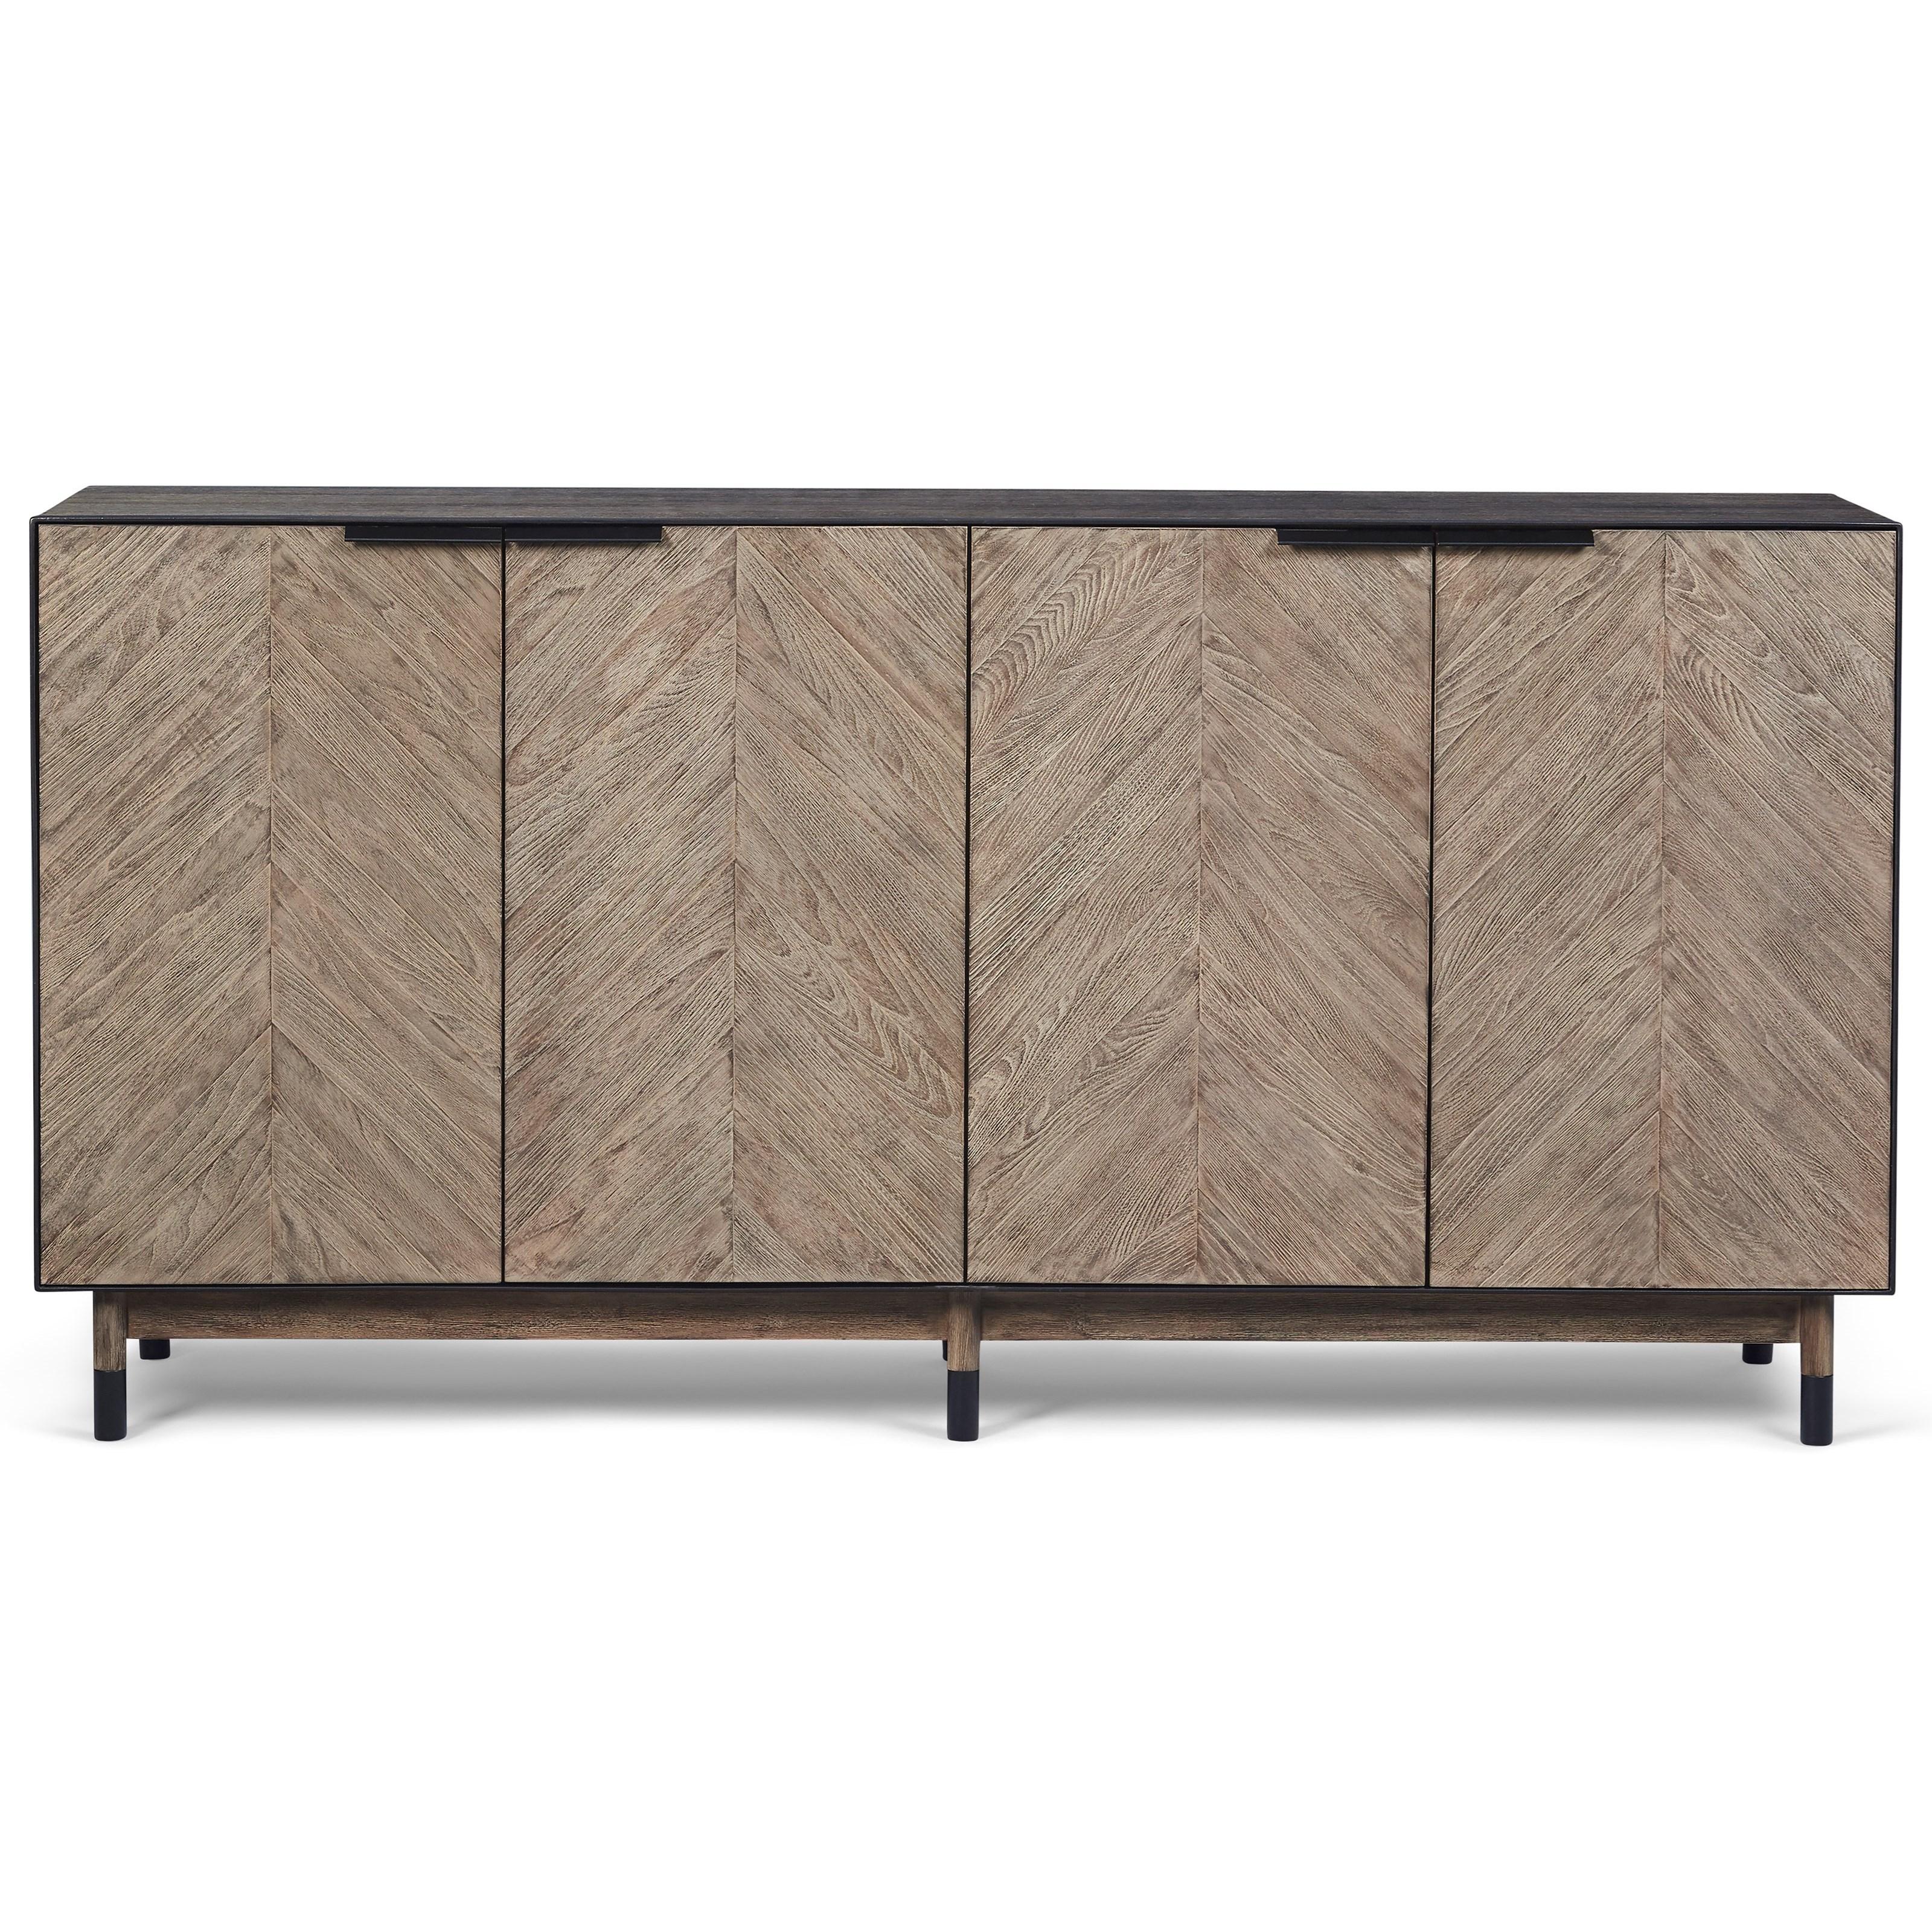 Marvelous A.R.T. Furniture Inc Epicenters AustinCedar Park Sideboard ...